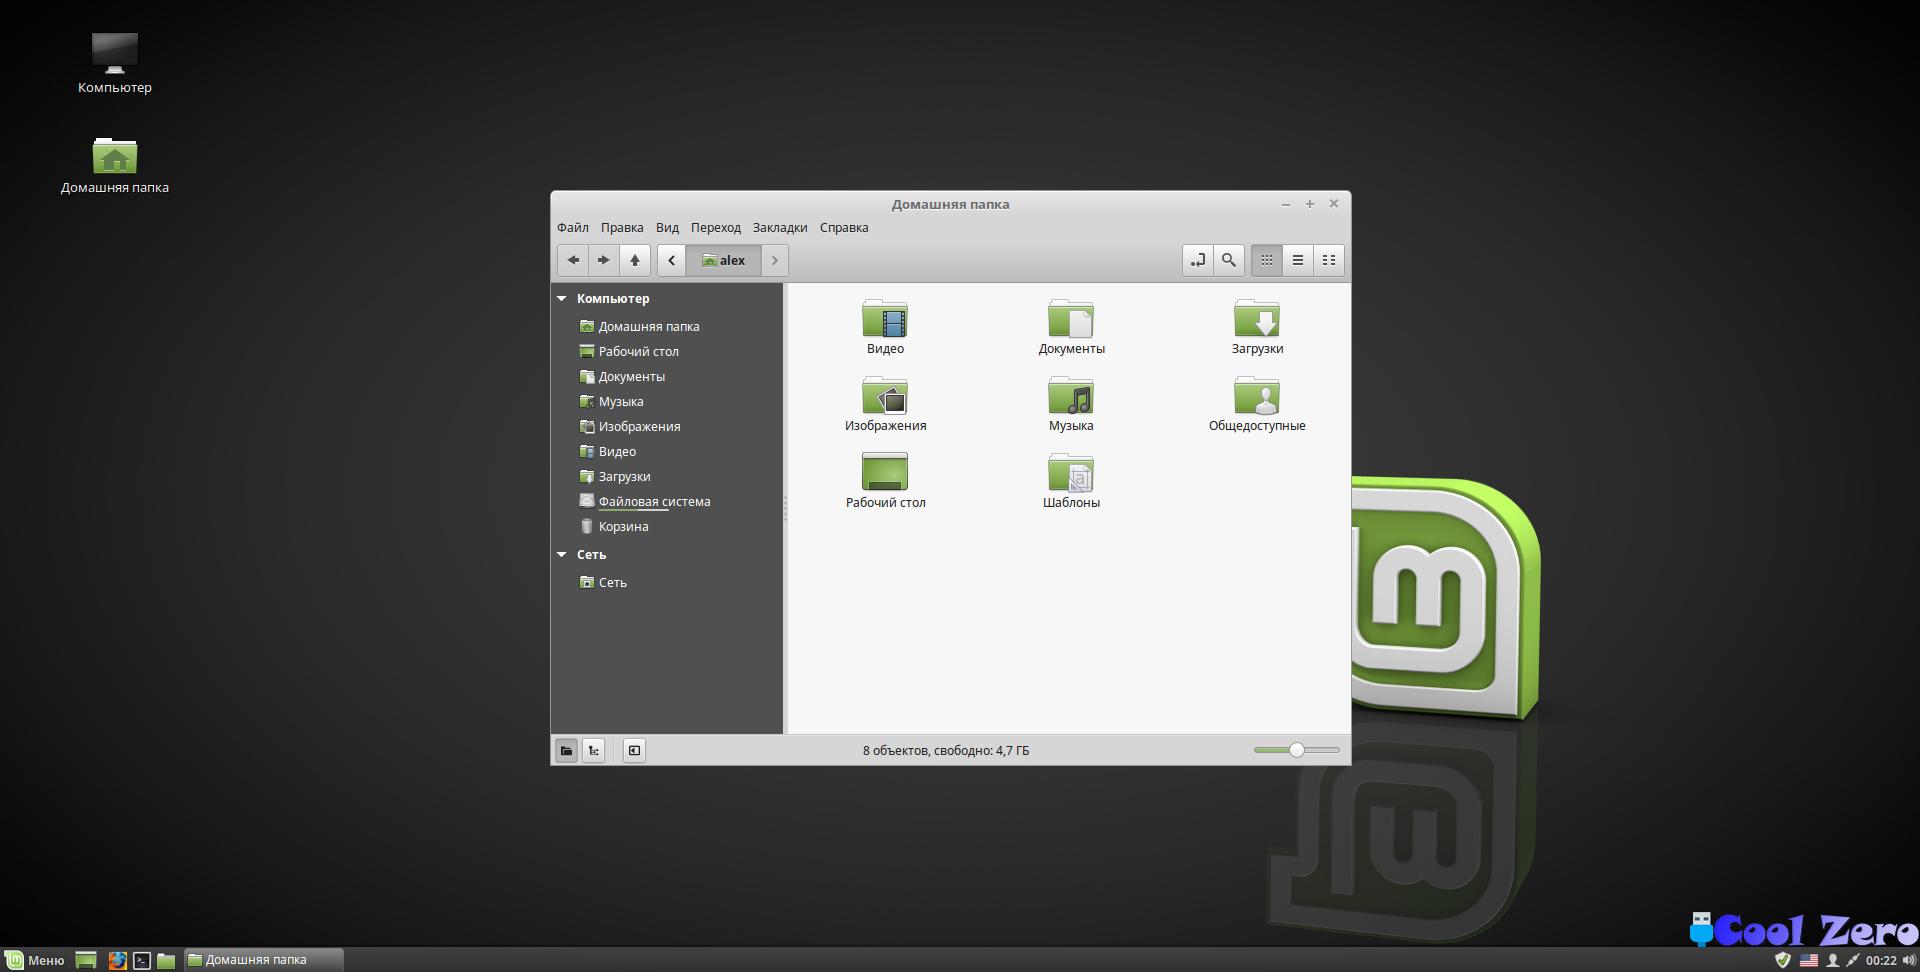 Linux Mint - Домашняя папка